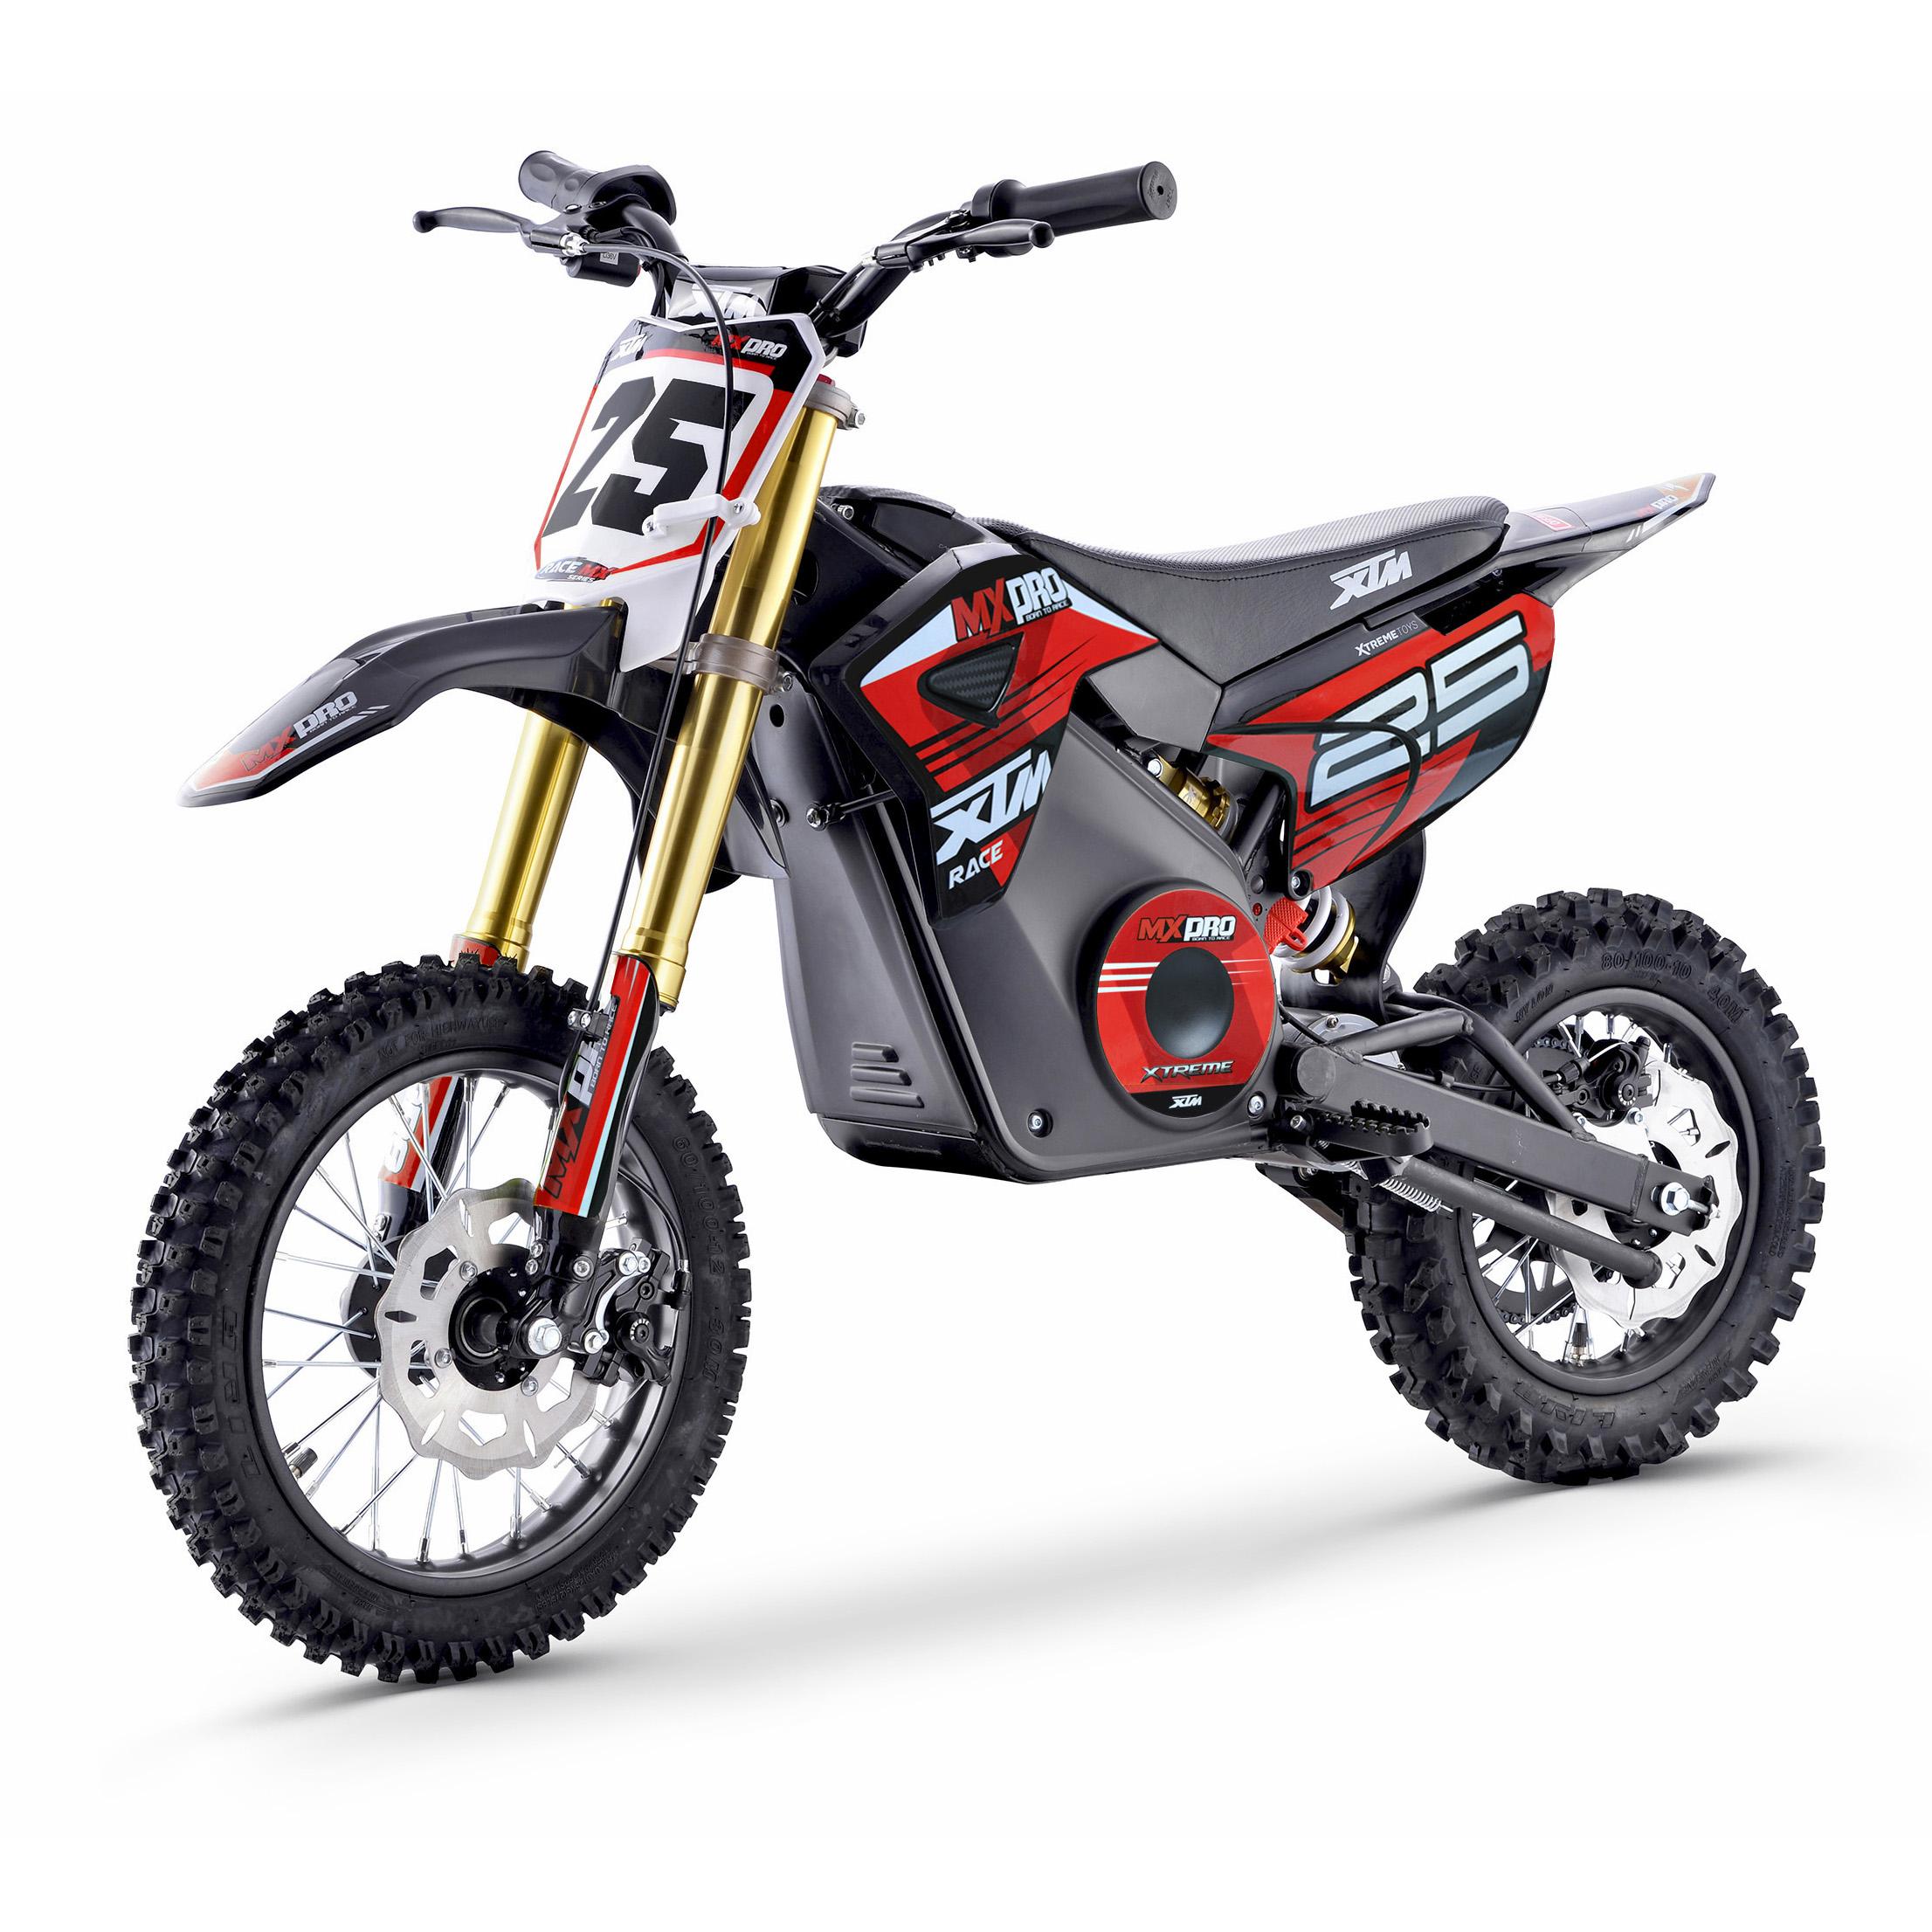 MX-PRO 36V Parts